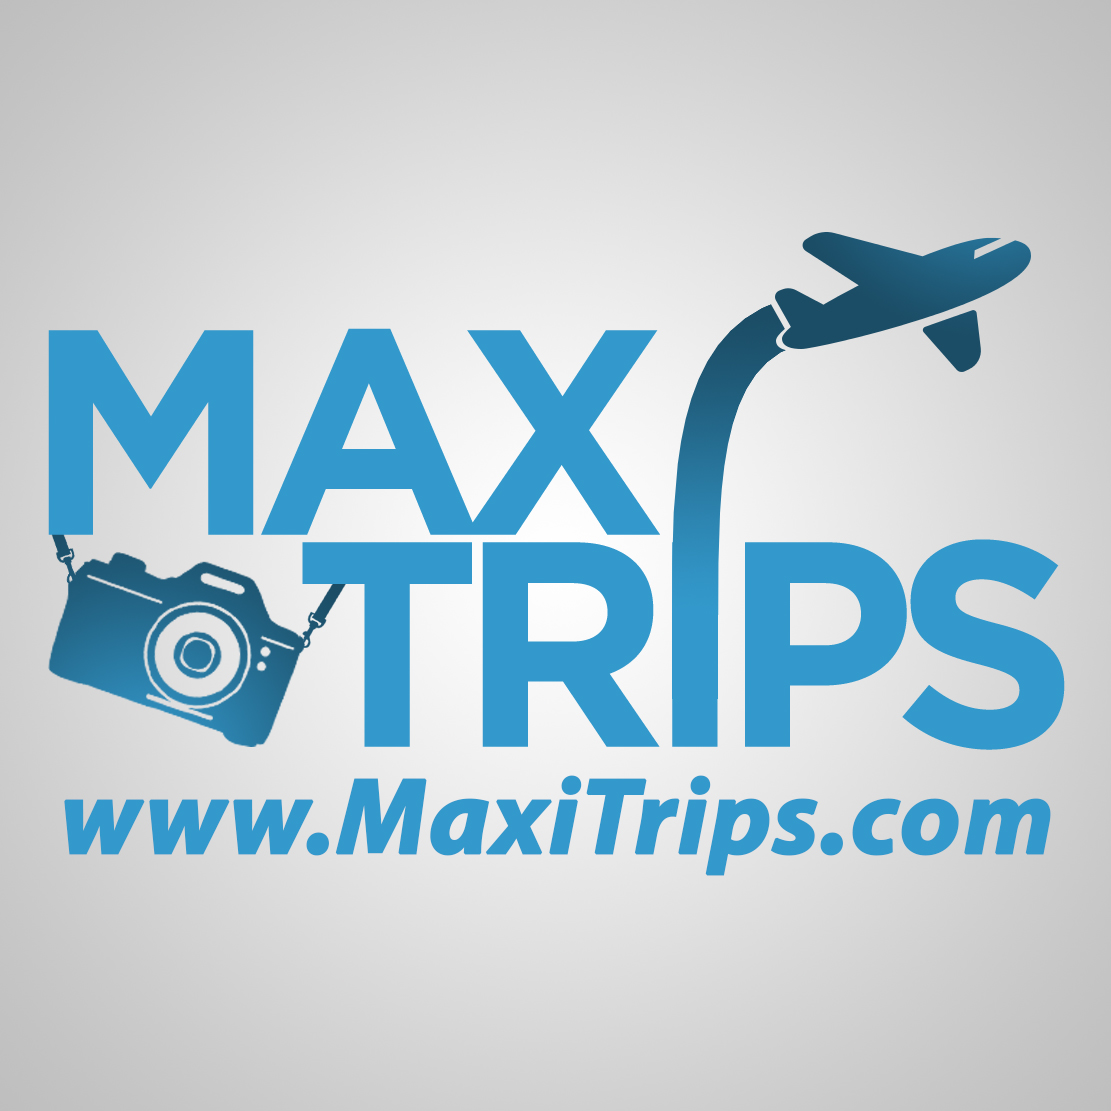 MaxiTrips.com